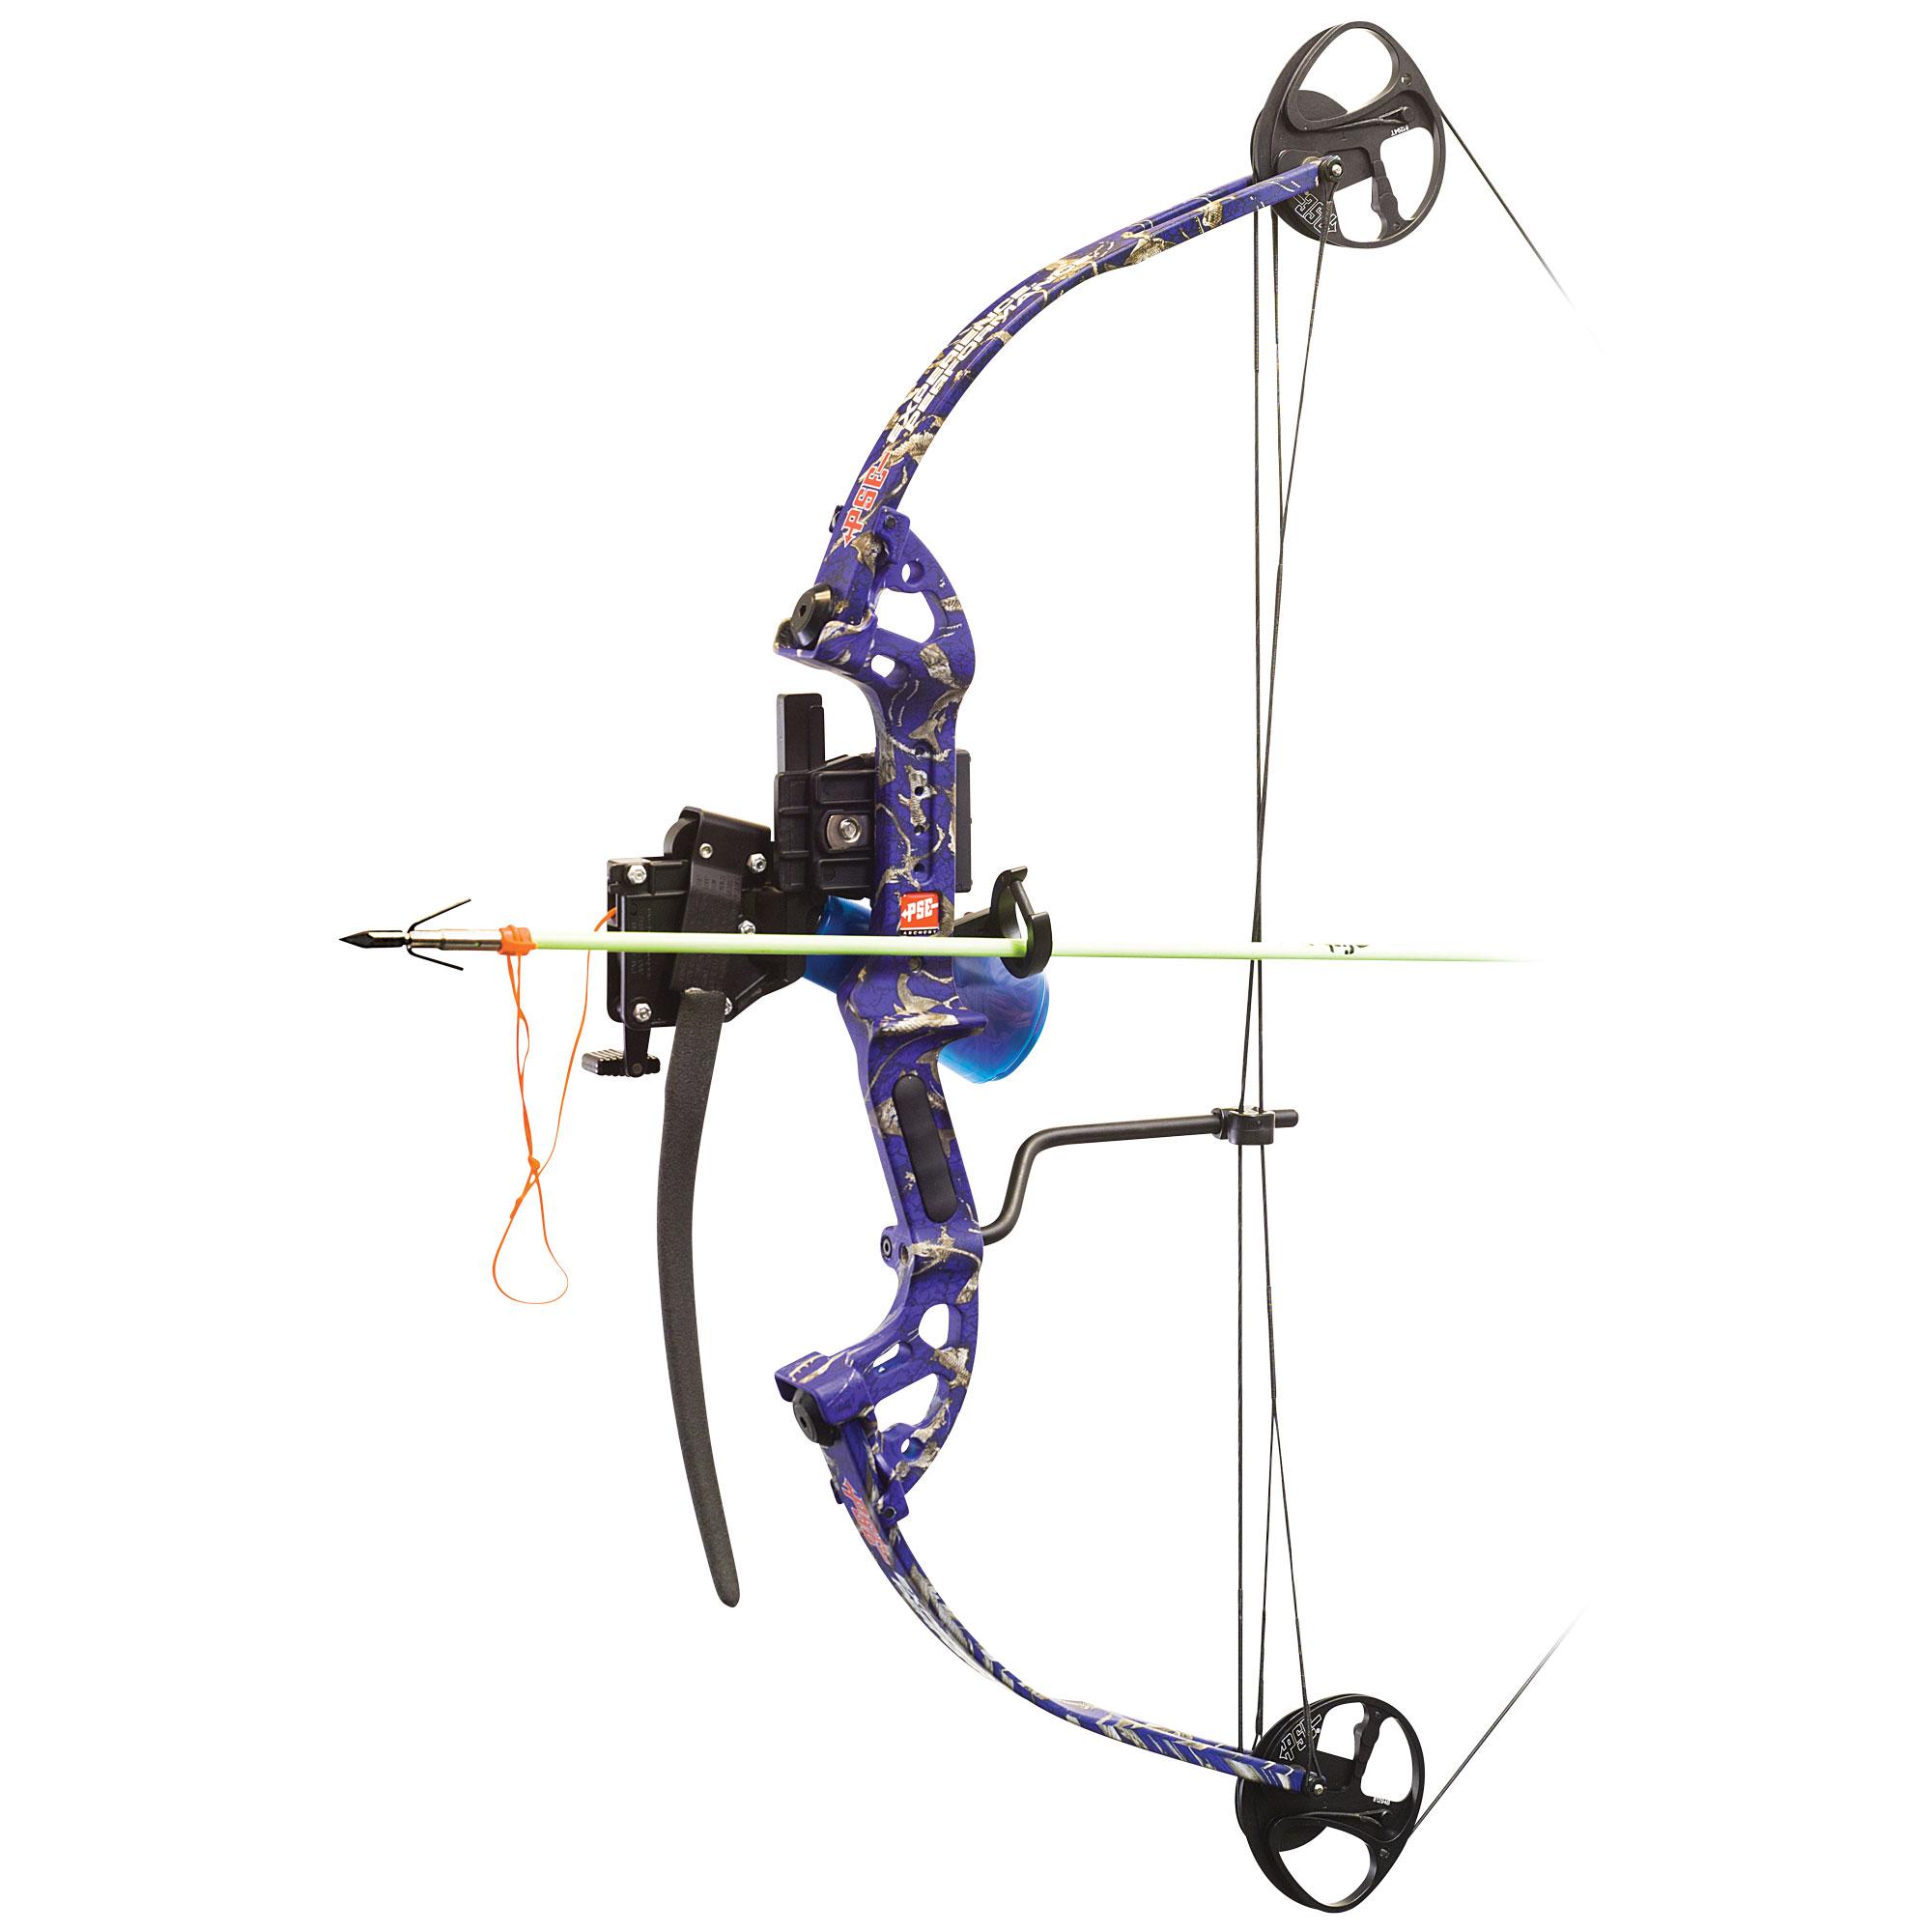 PSE Archery Discovery Bowfishing Kit